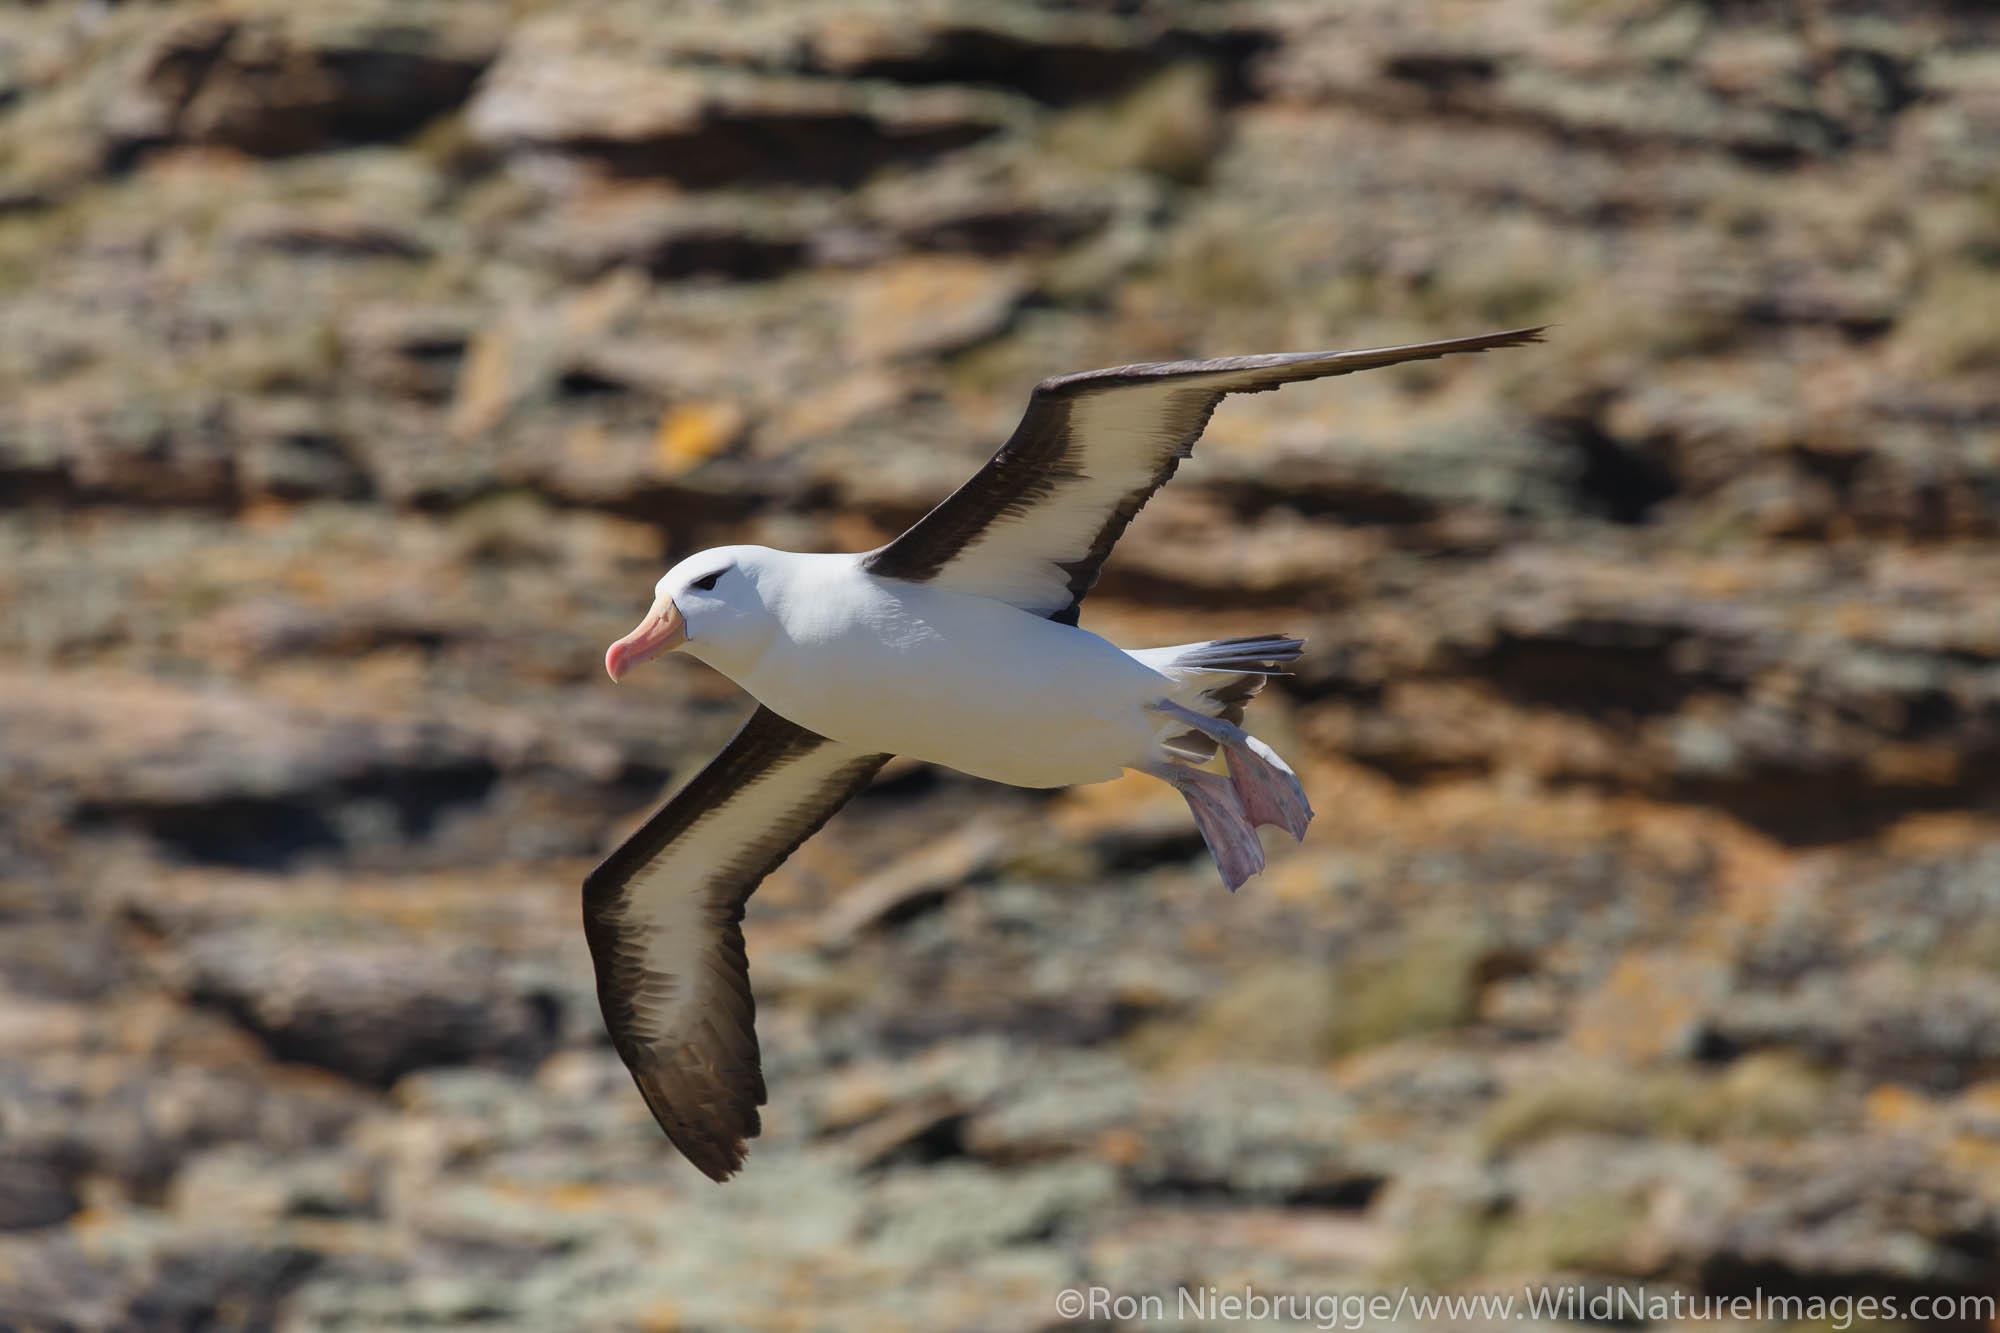 Black-browed Albatross, New Island Conservation Trust, New Island, Falkland Islands.